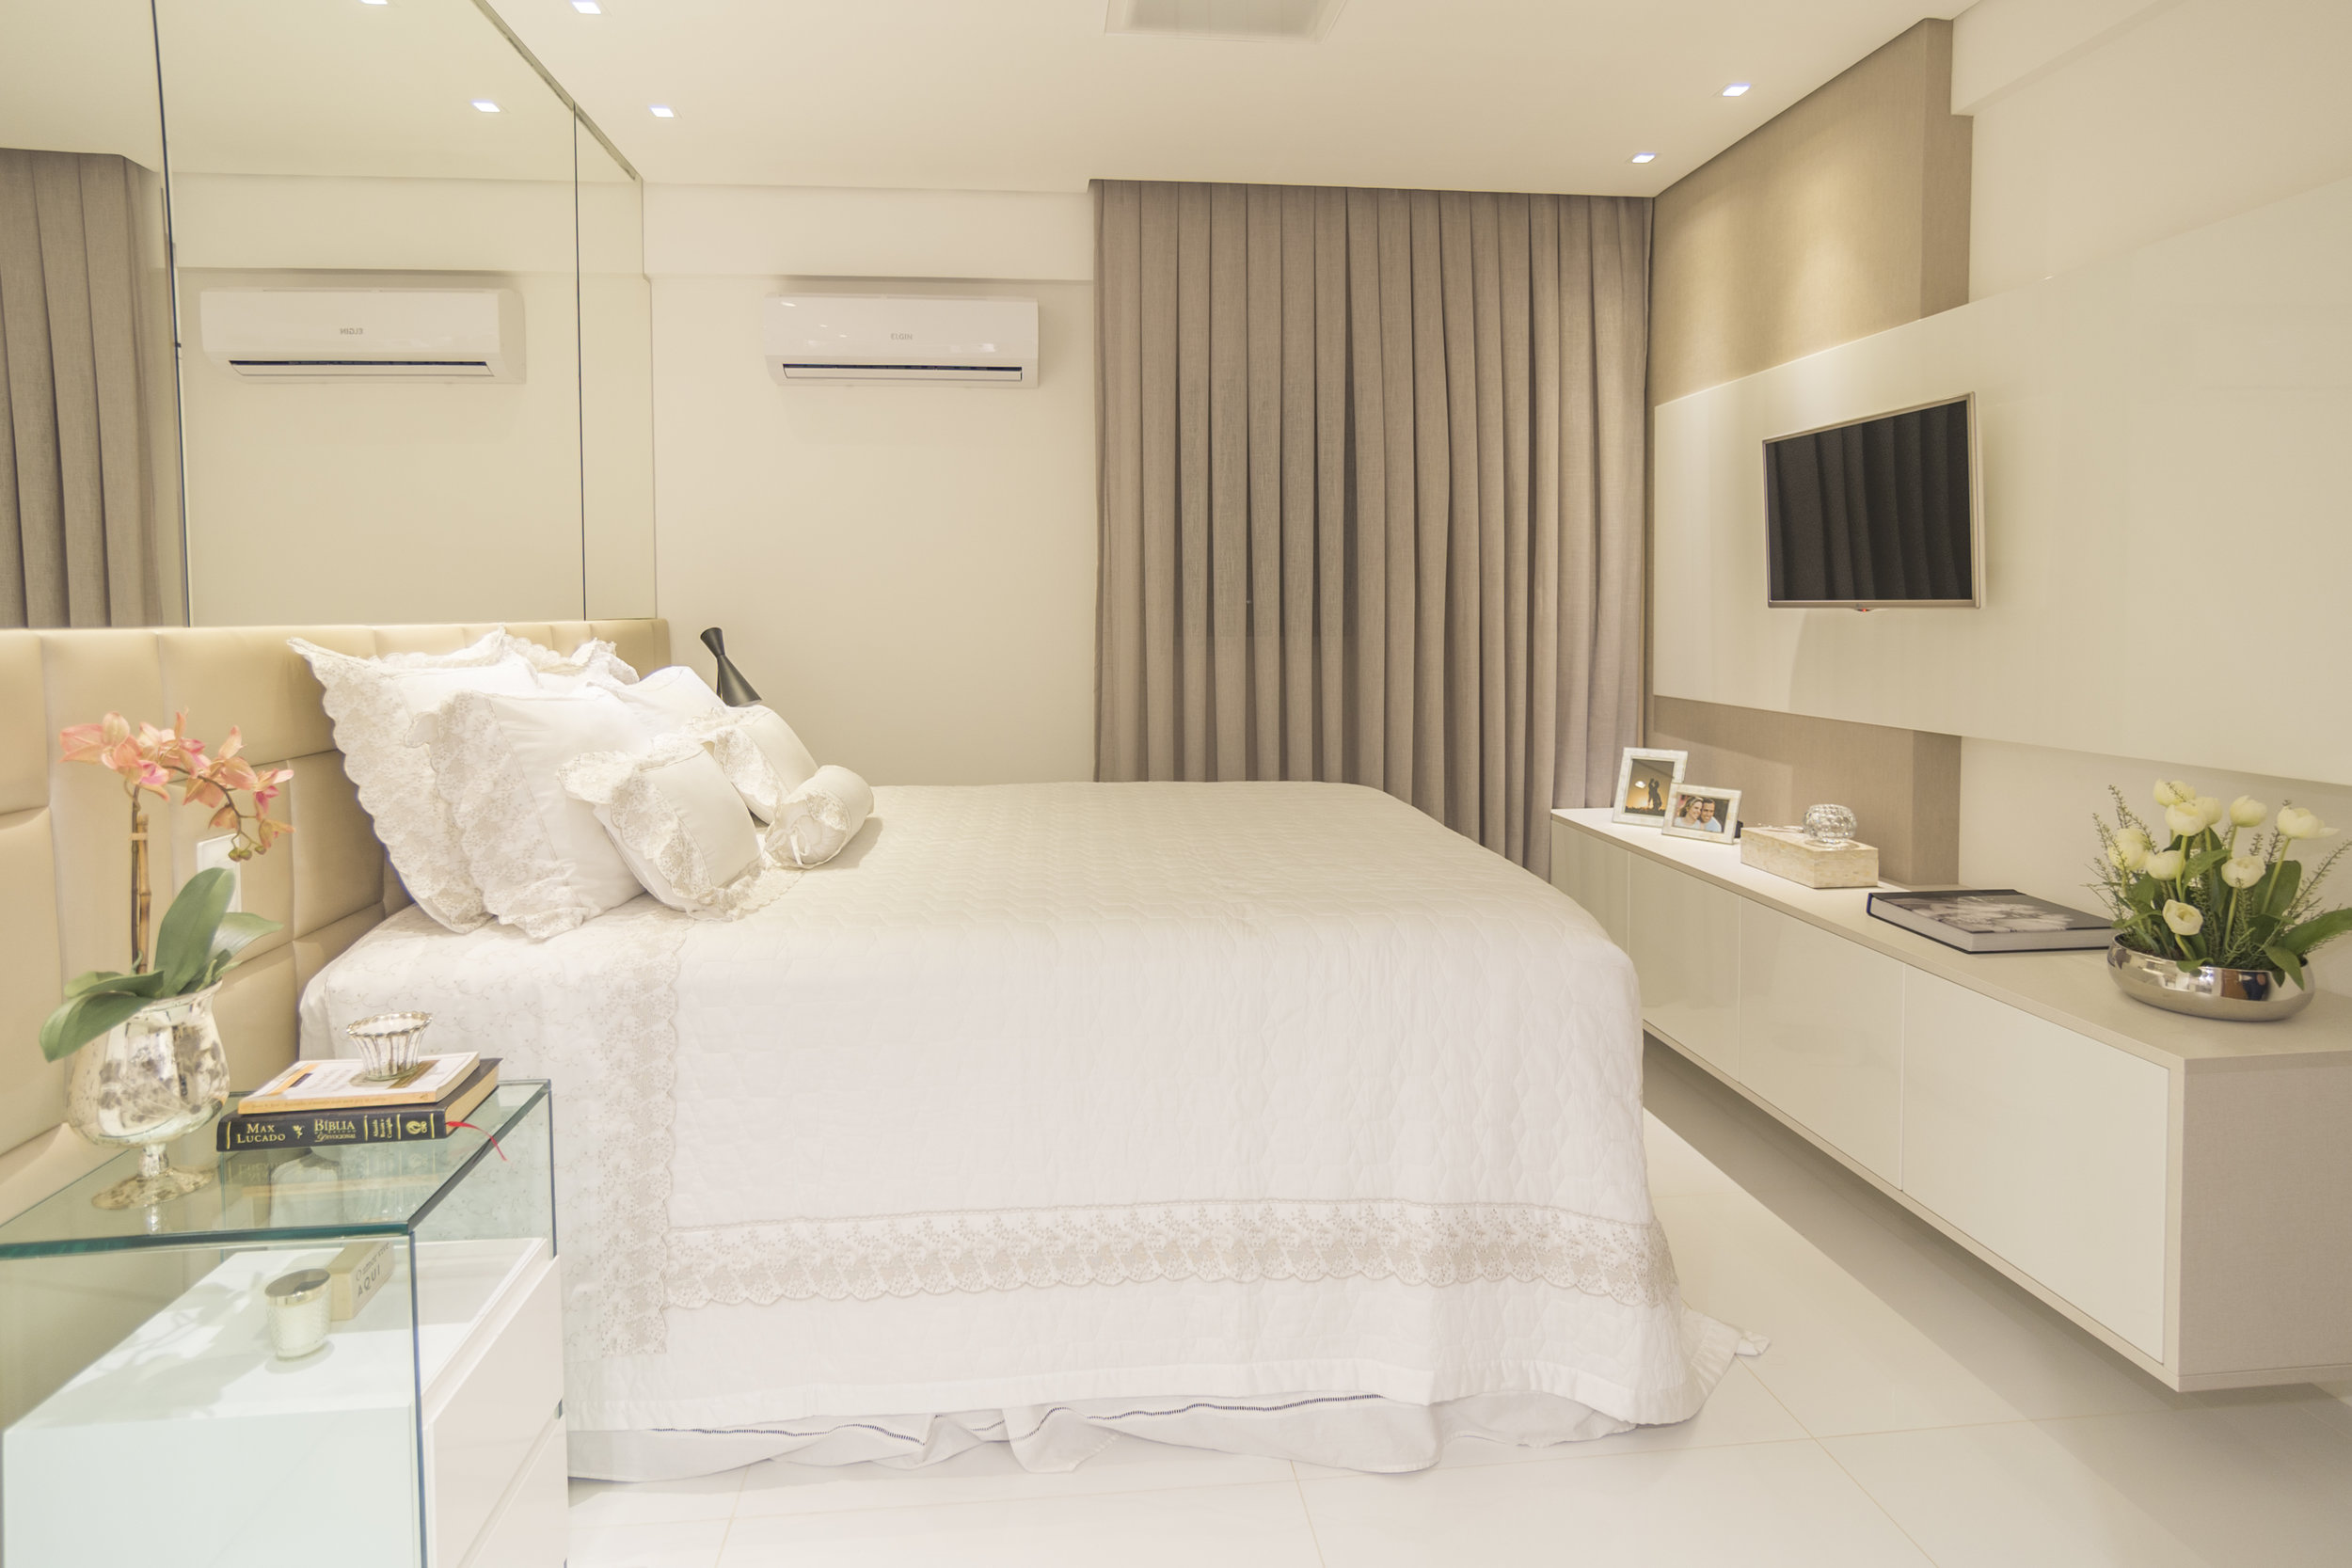 projeto-arquitetonico-robertoindira-duo-arquitetura-apartamentos-quarto-04.jpg